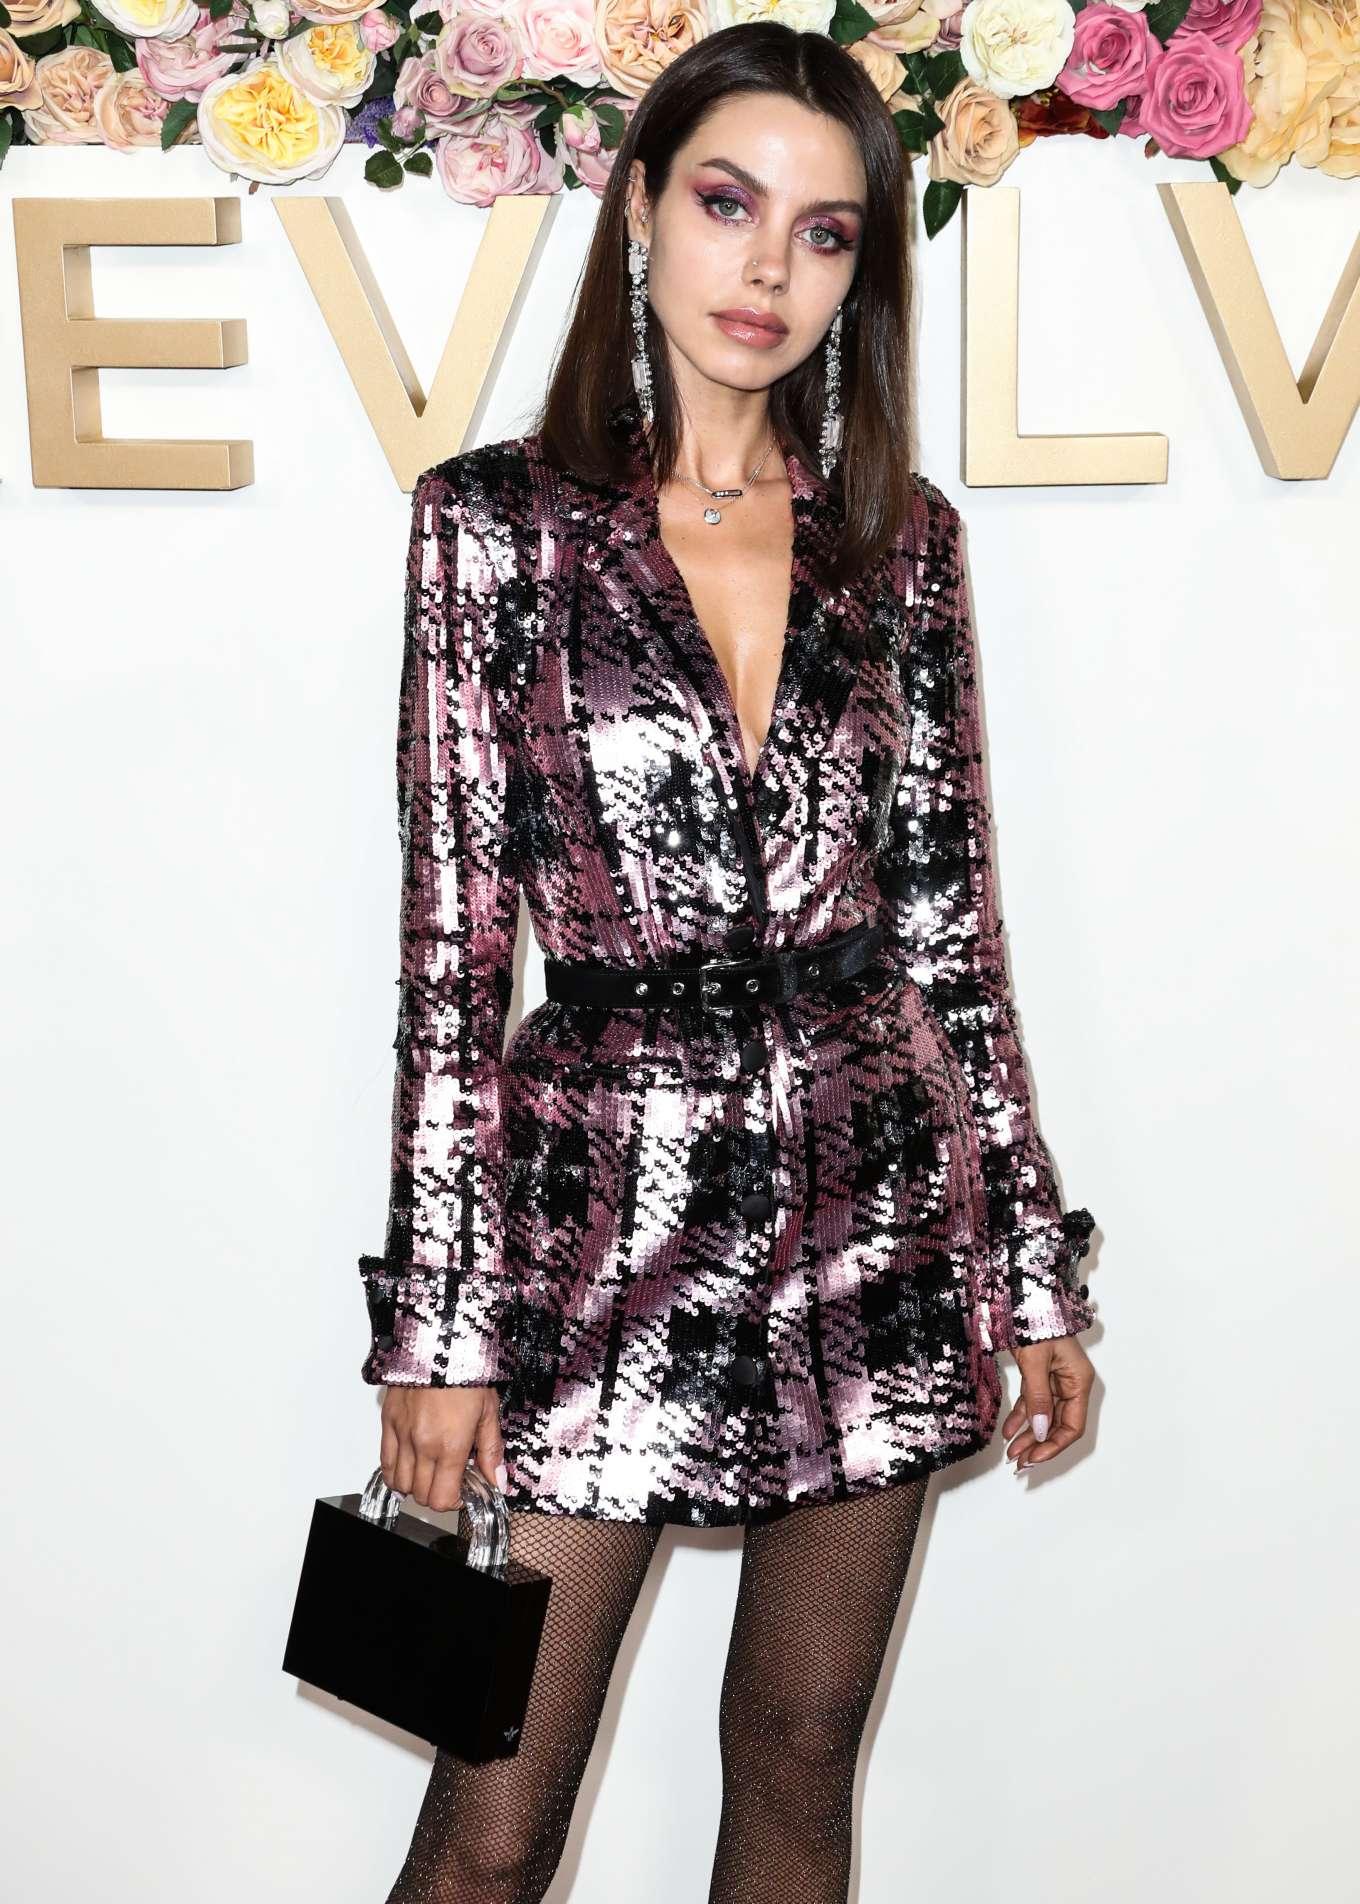 Annabelle Fleur - 2019 REVOLVE Awards in Hollywood